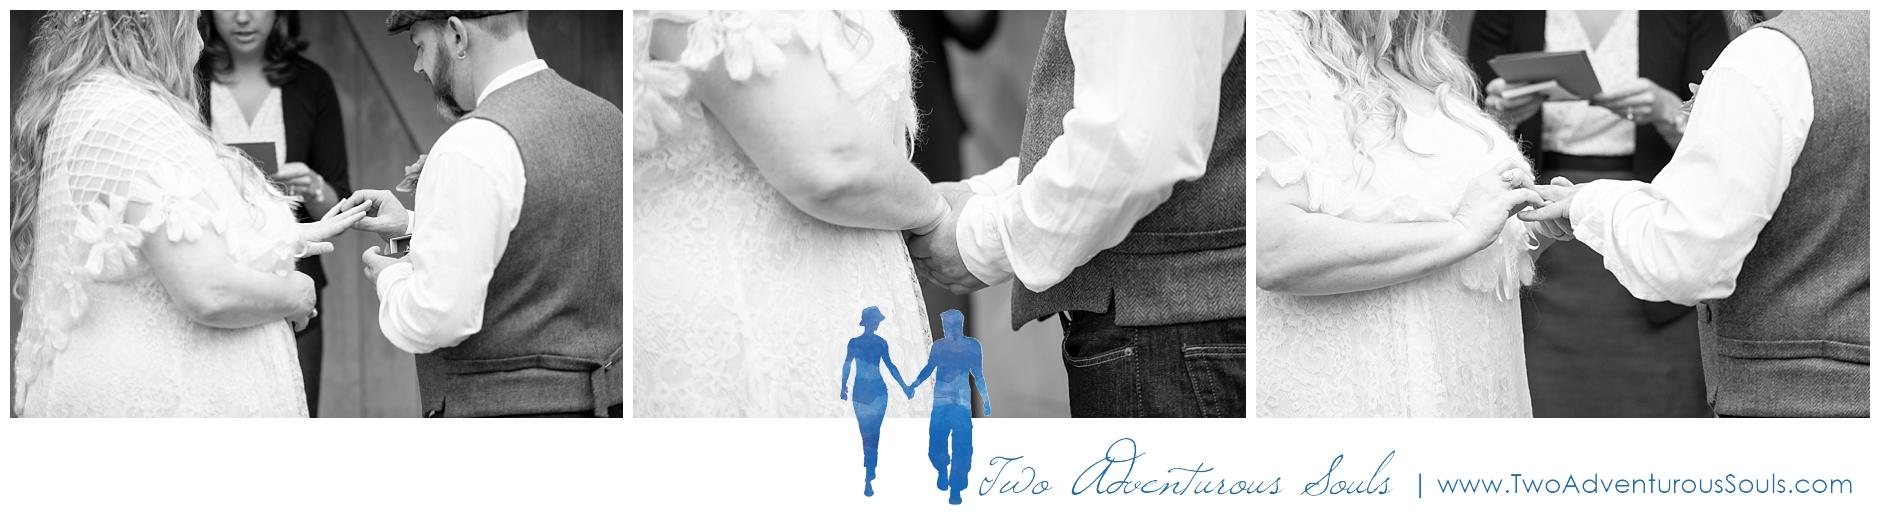 091218 - Chad & Kimmi - sneaks-21_Hidden Pond Wedding, Earth at Hidden Pond, Kennebunkport Wedding.jpg